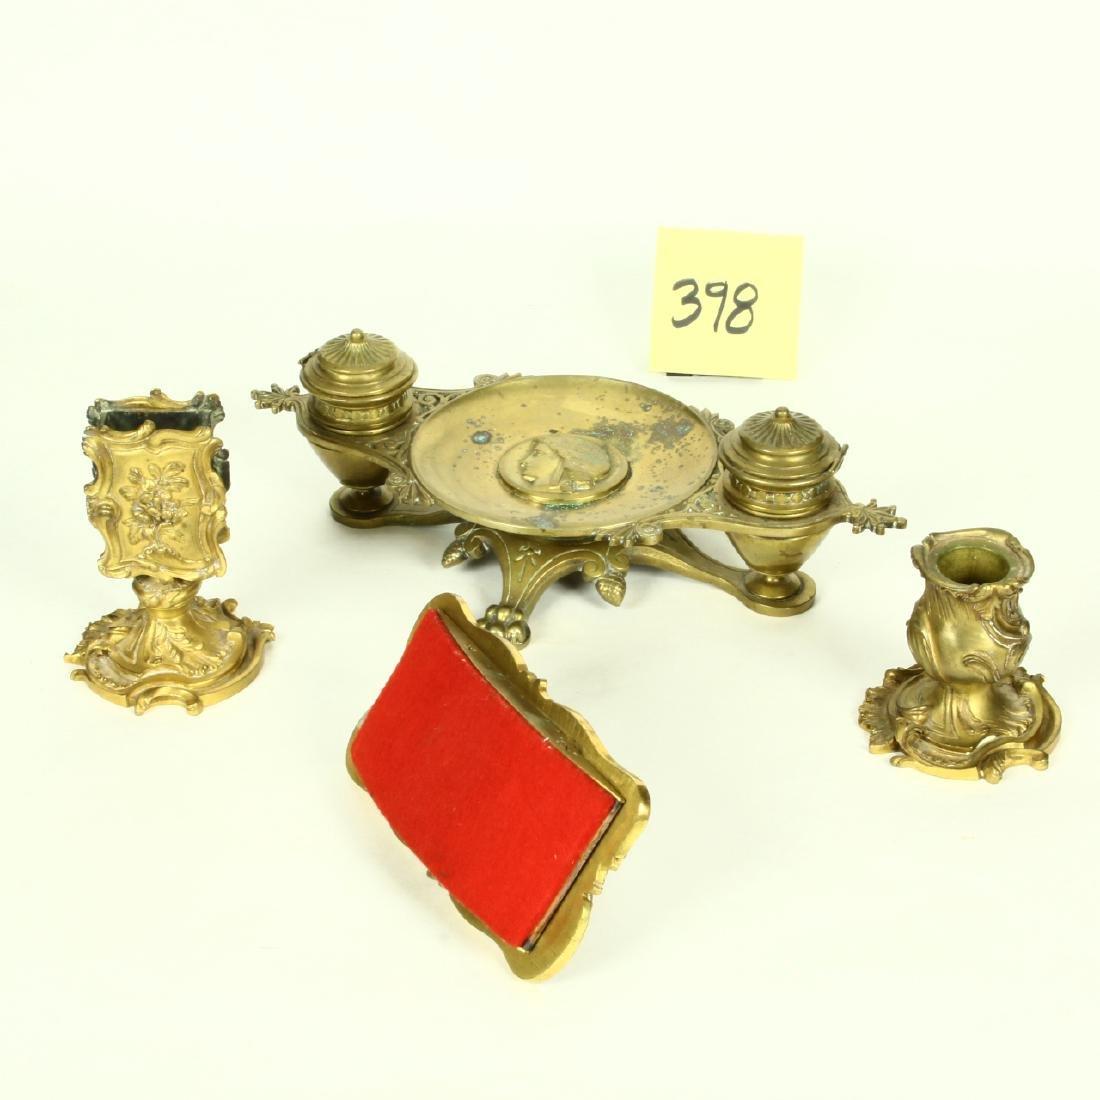 Victorian Ornate Brass Desk Set Ink Well Match Holder - 2